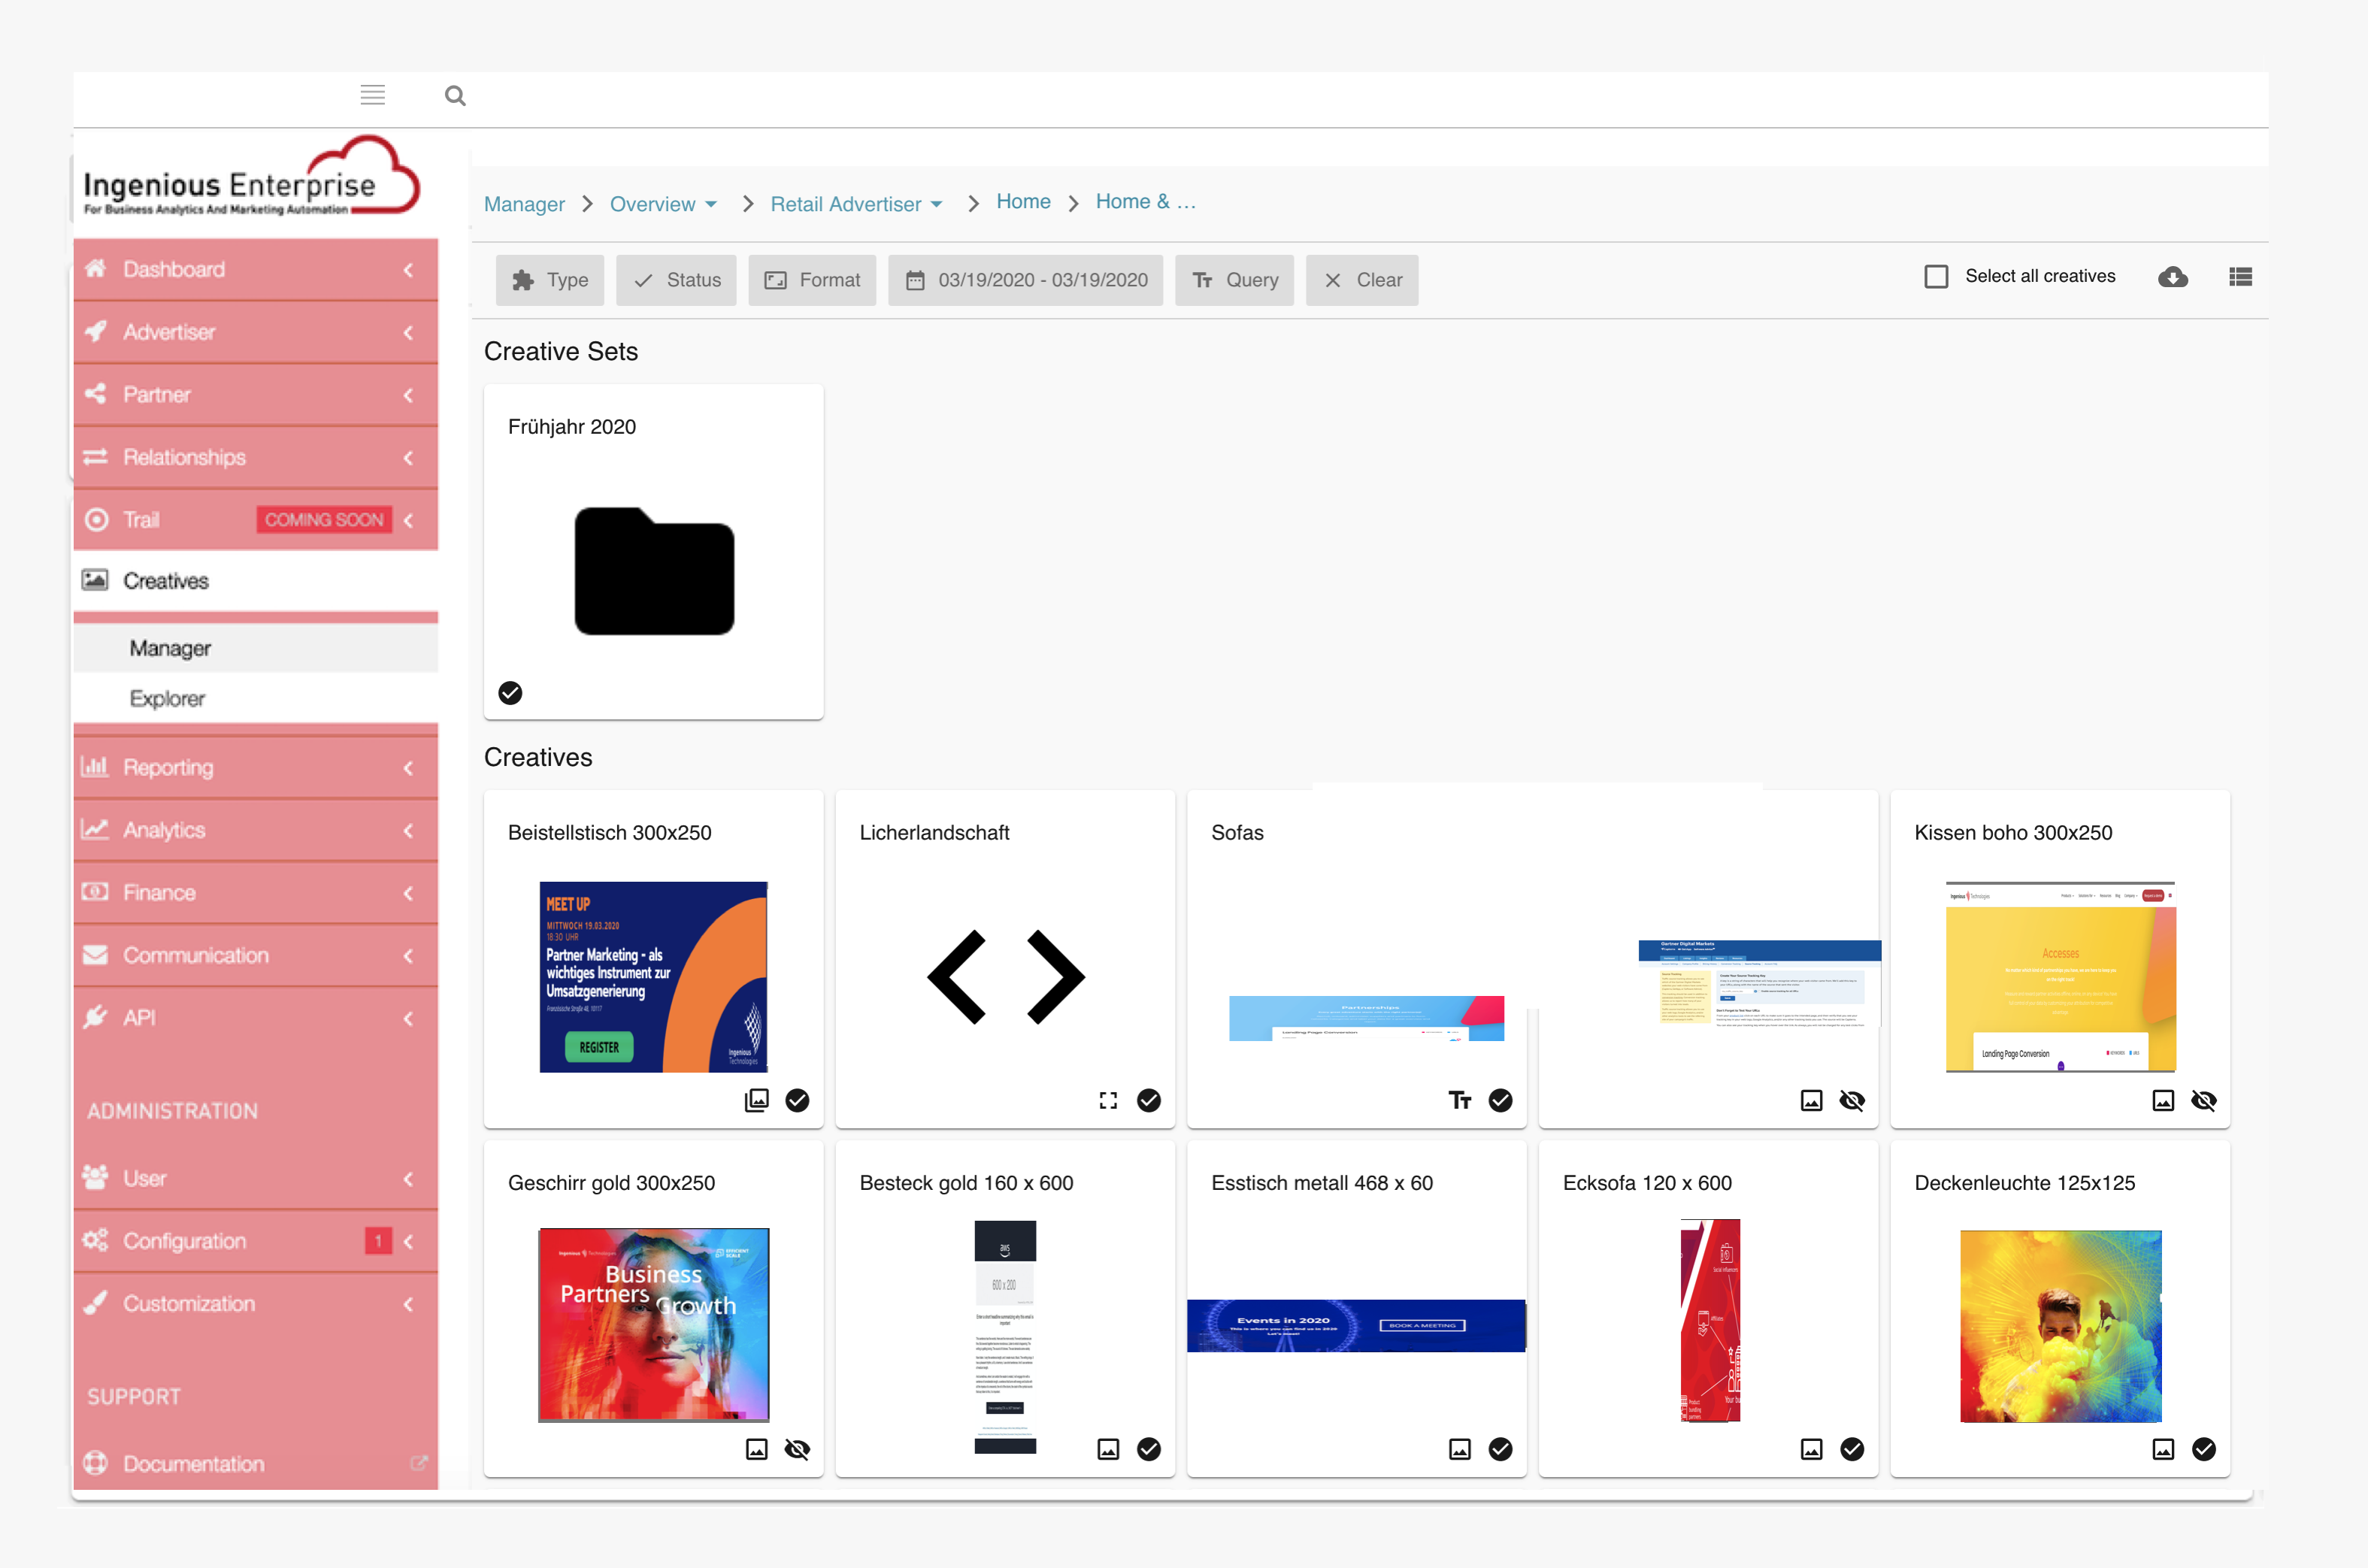 Ingenious Partner Marketing Platform content management